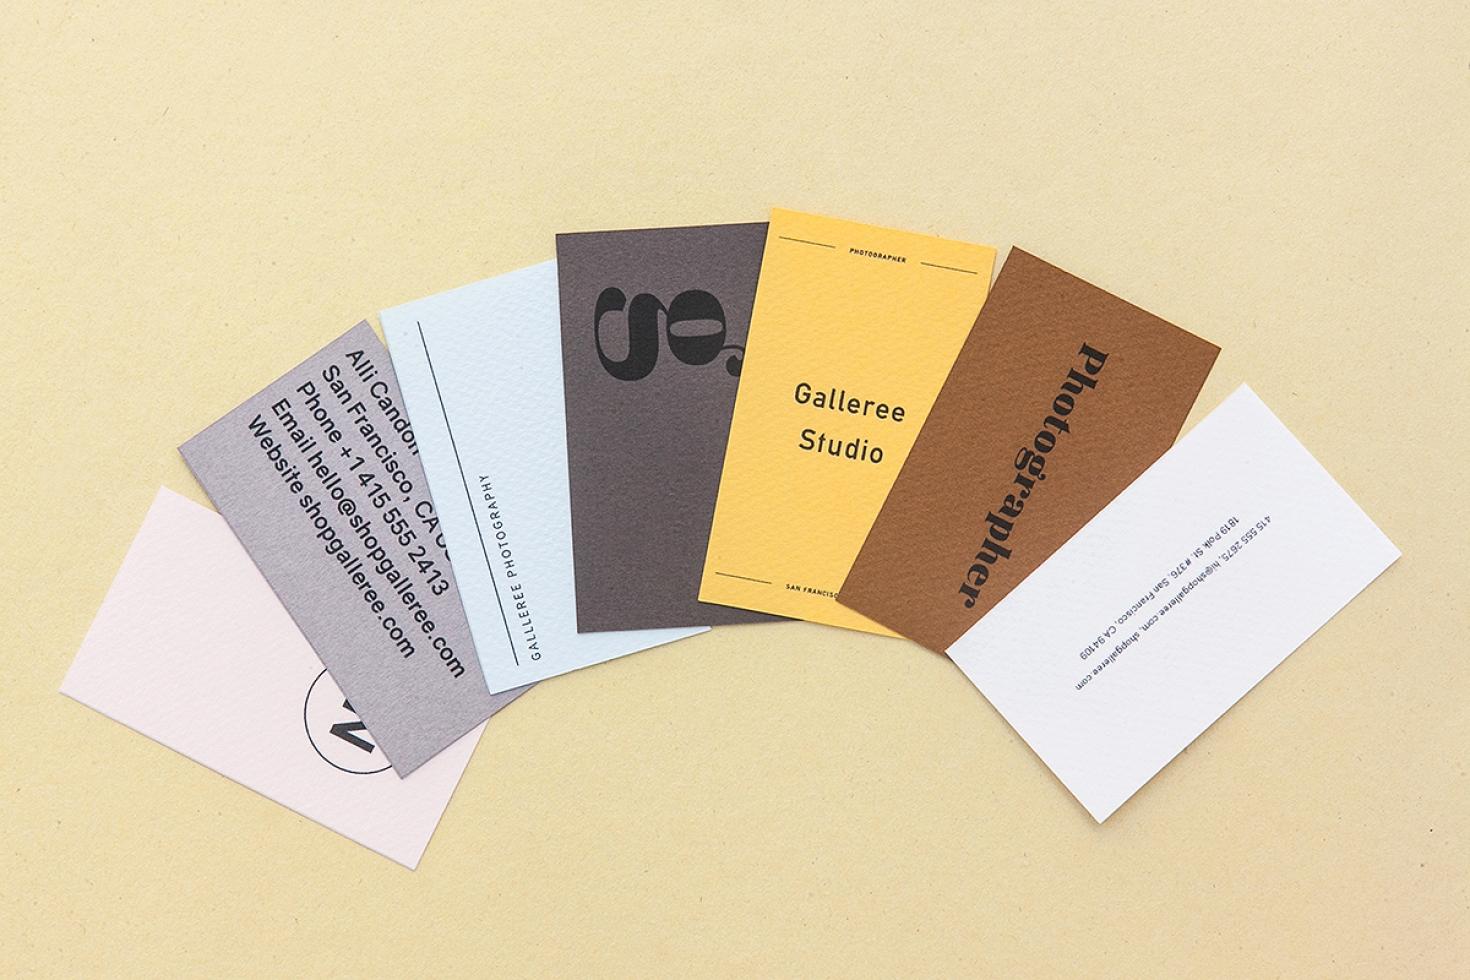 Artsy studio business cards shopgalleree photography artsy studio business cards colourmoves